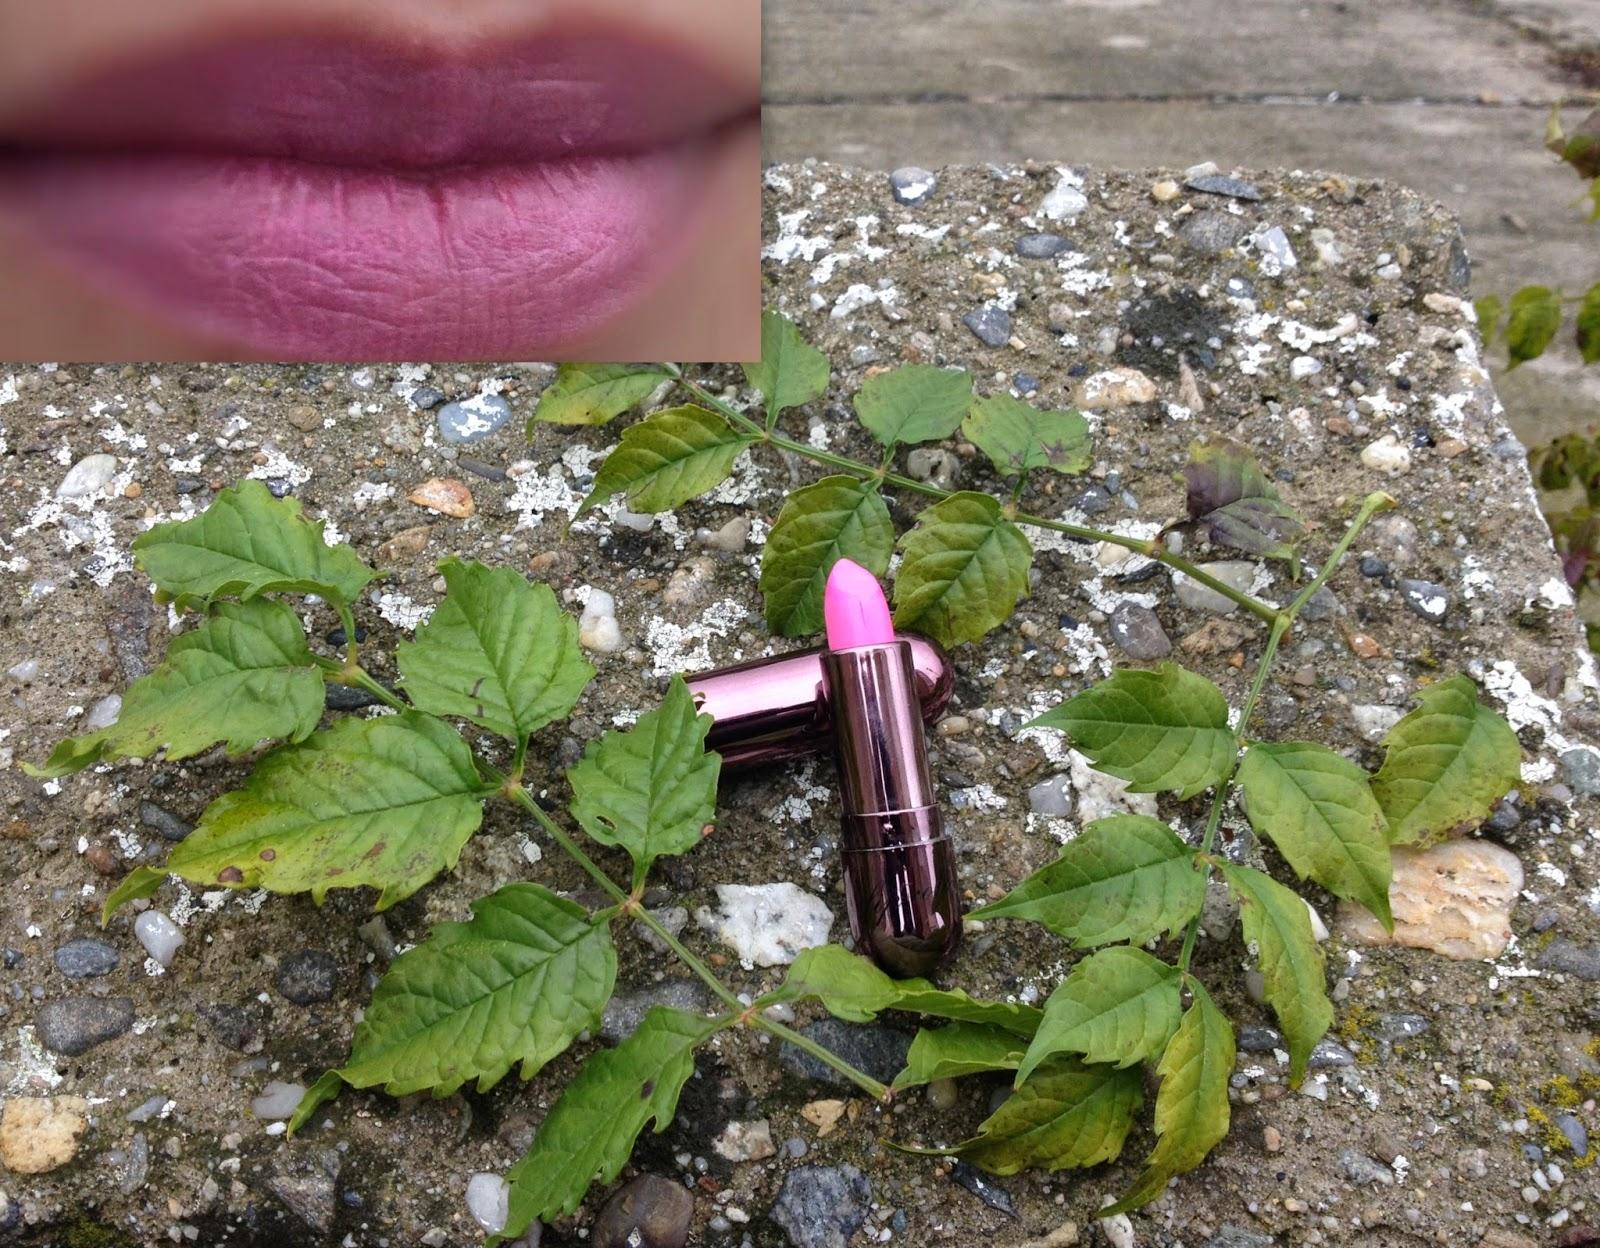 http://www.oasap.com/lip/42328-4-colors-moisturize-lipstick.html